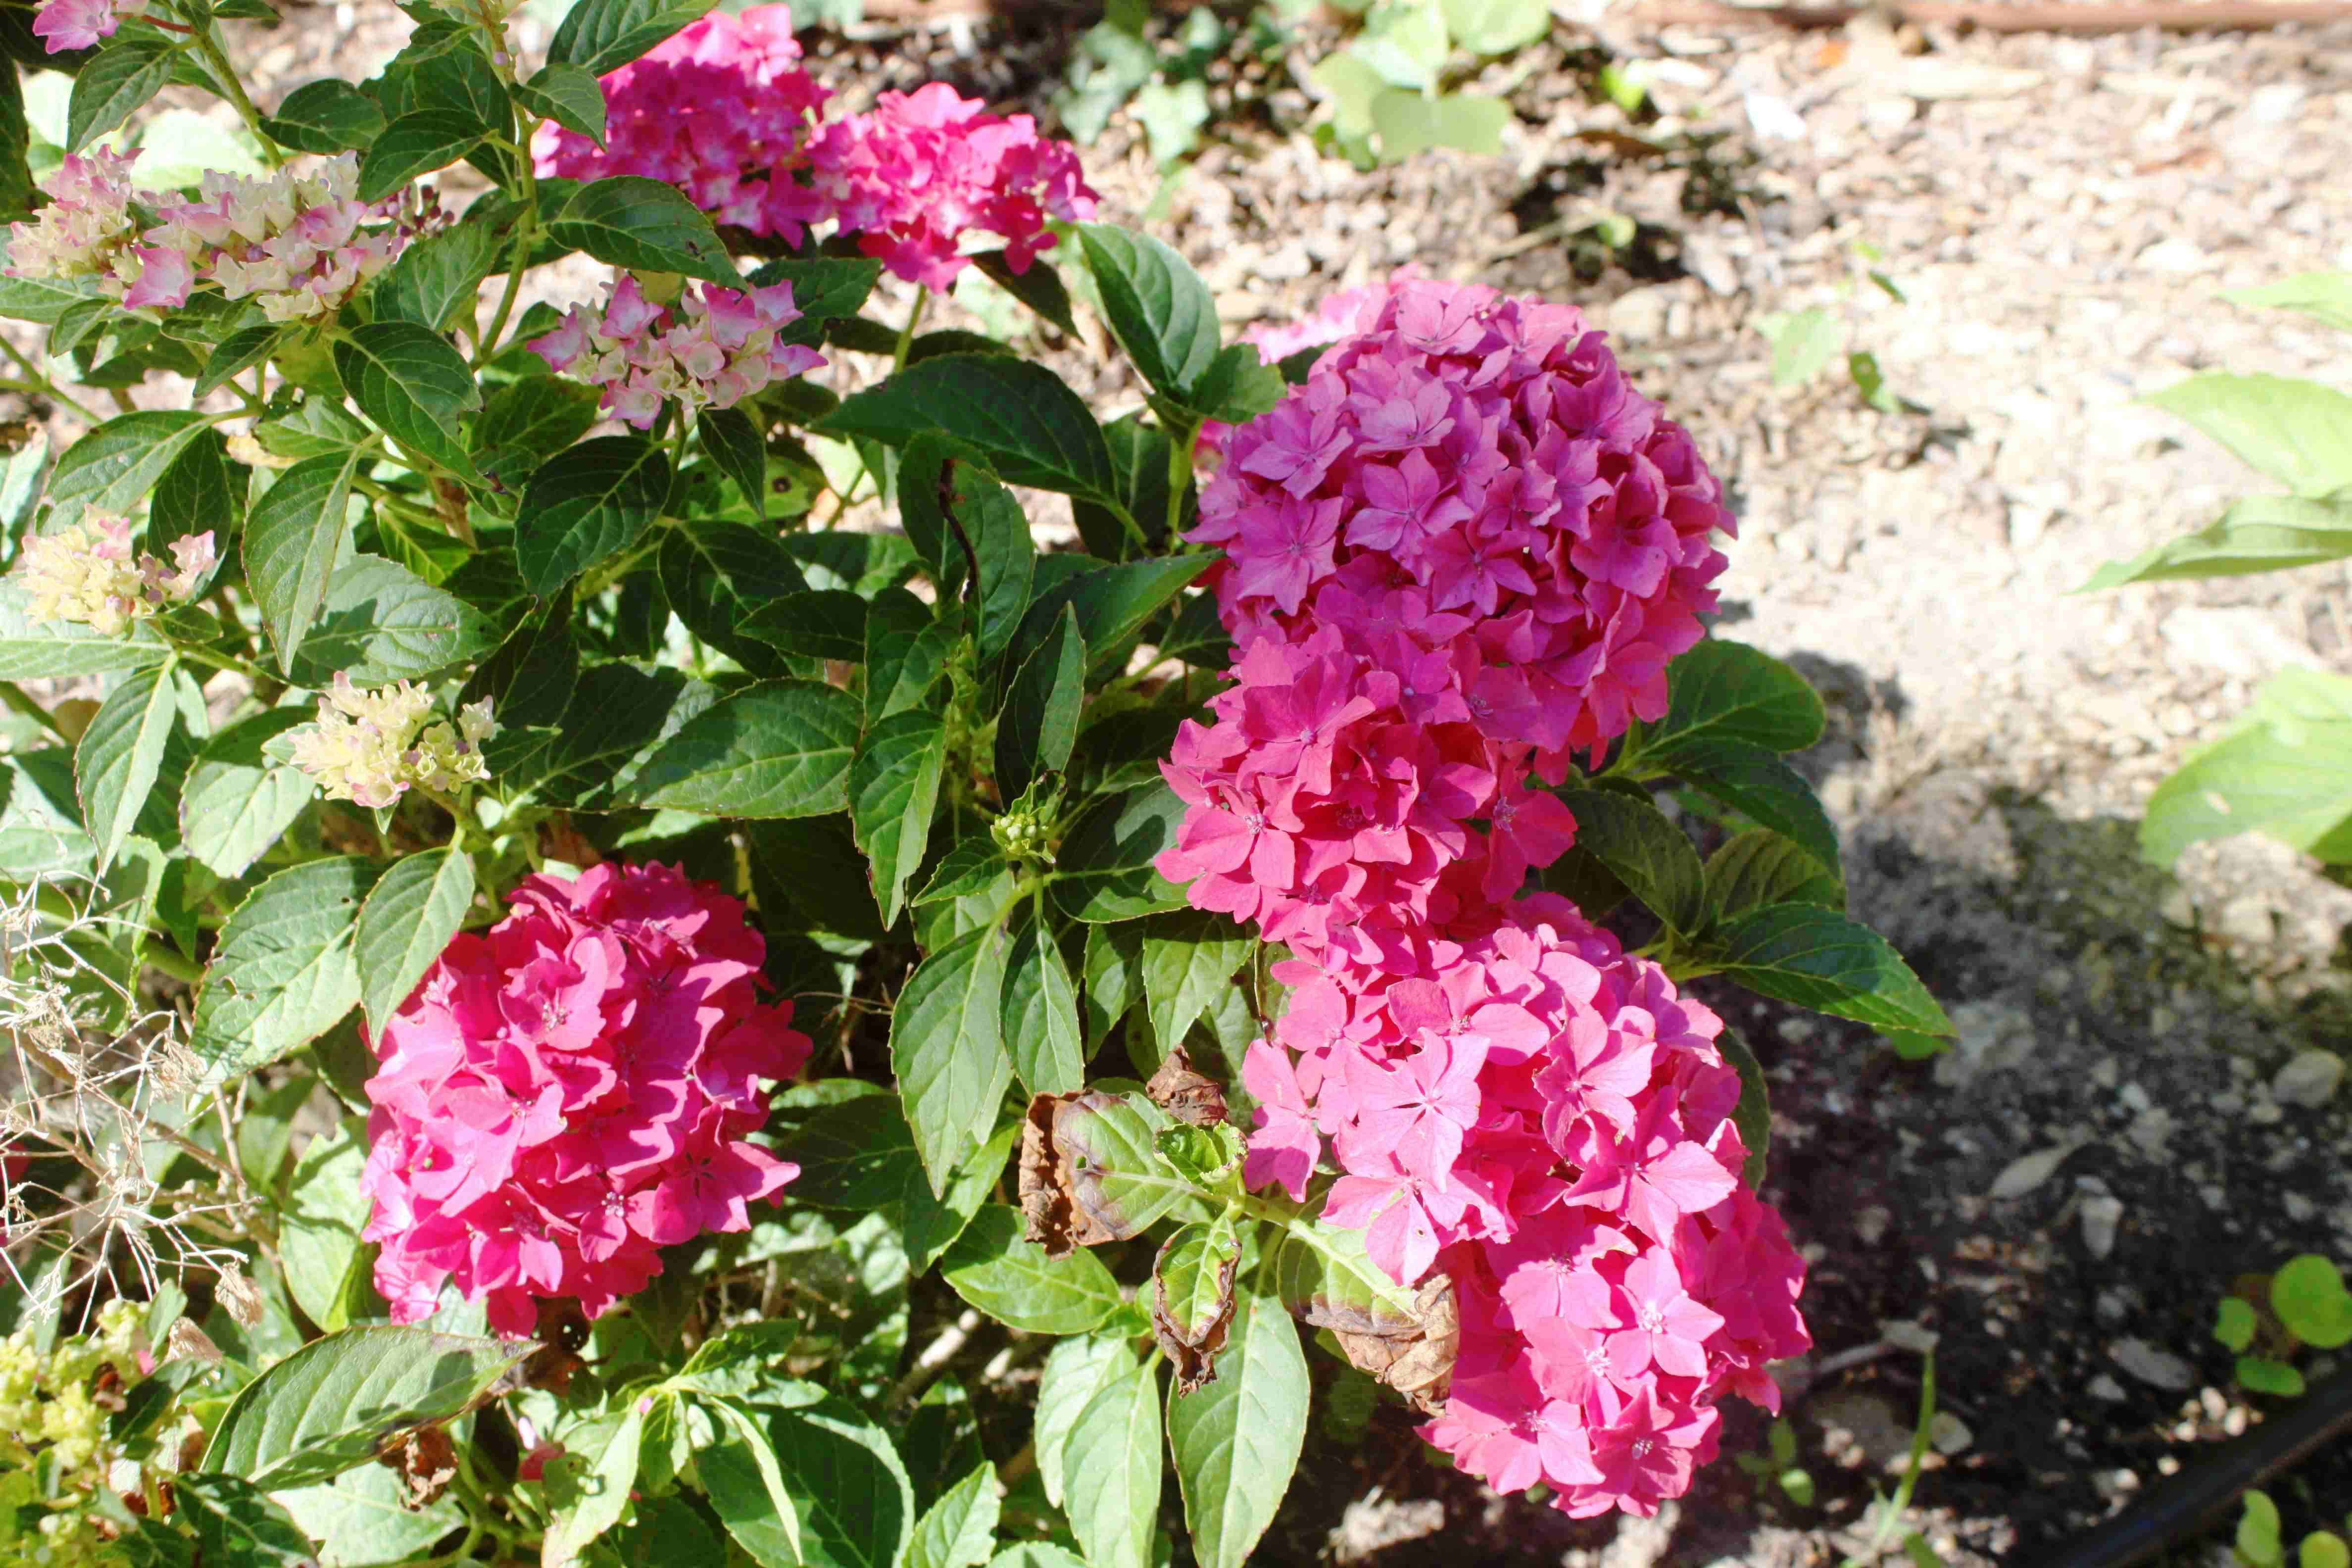 Hydrangea-Macrophylla-2-Hydrangeacees